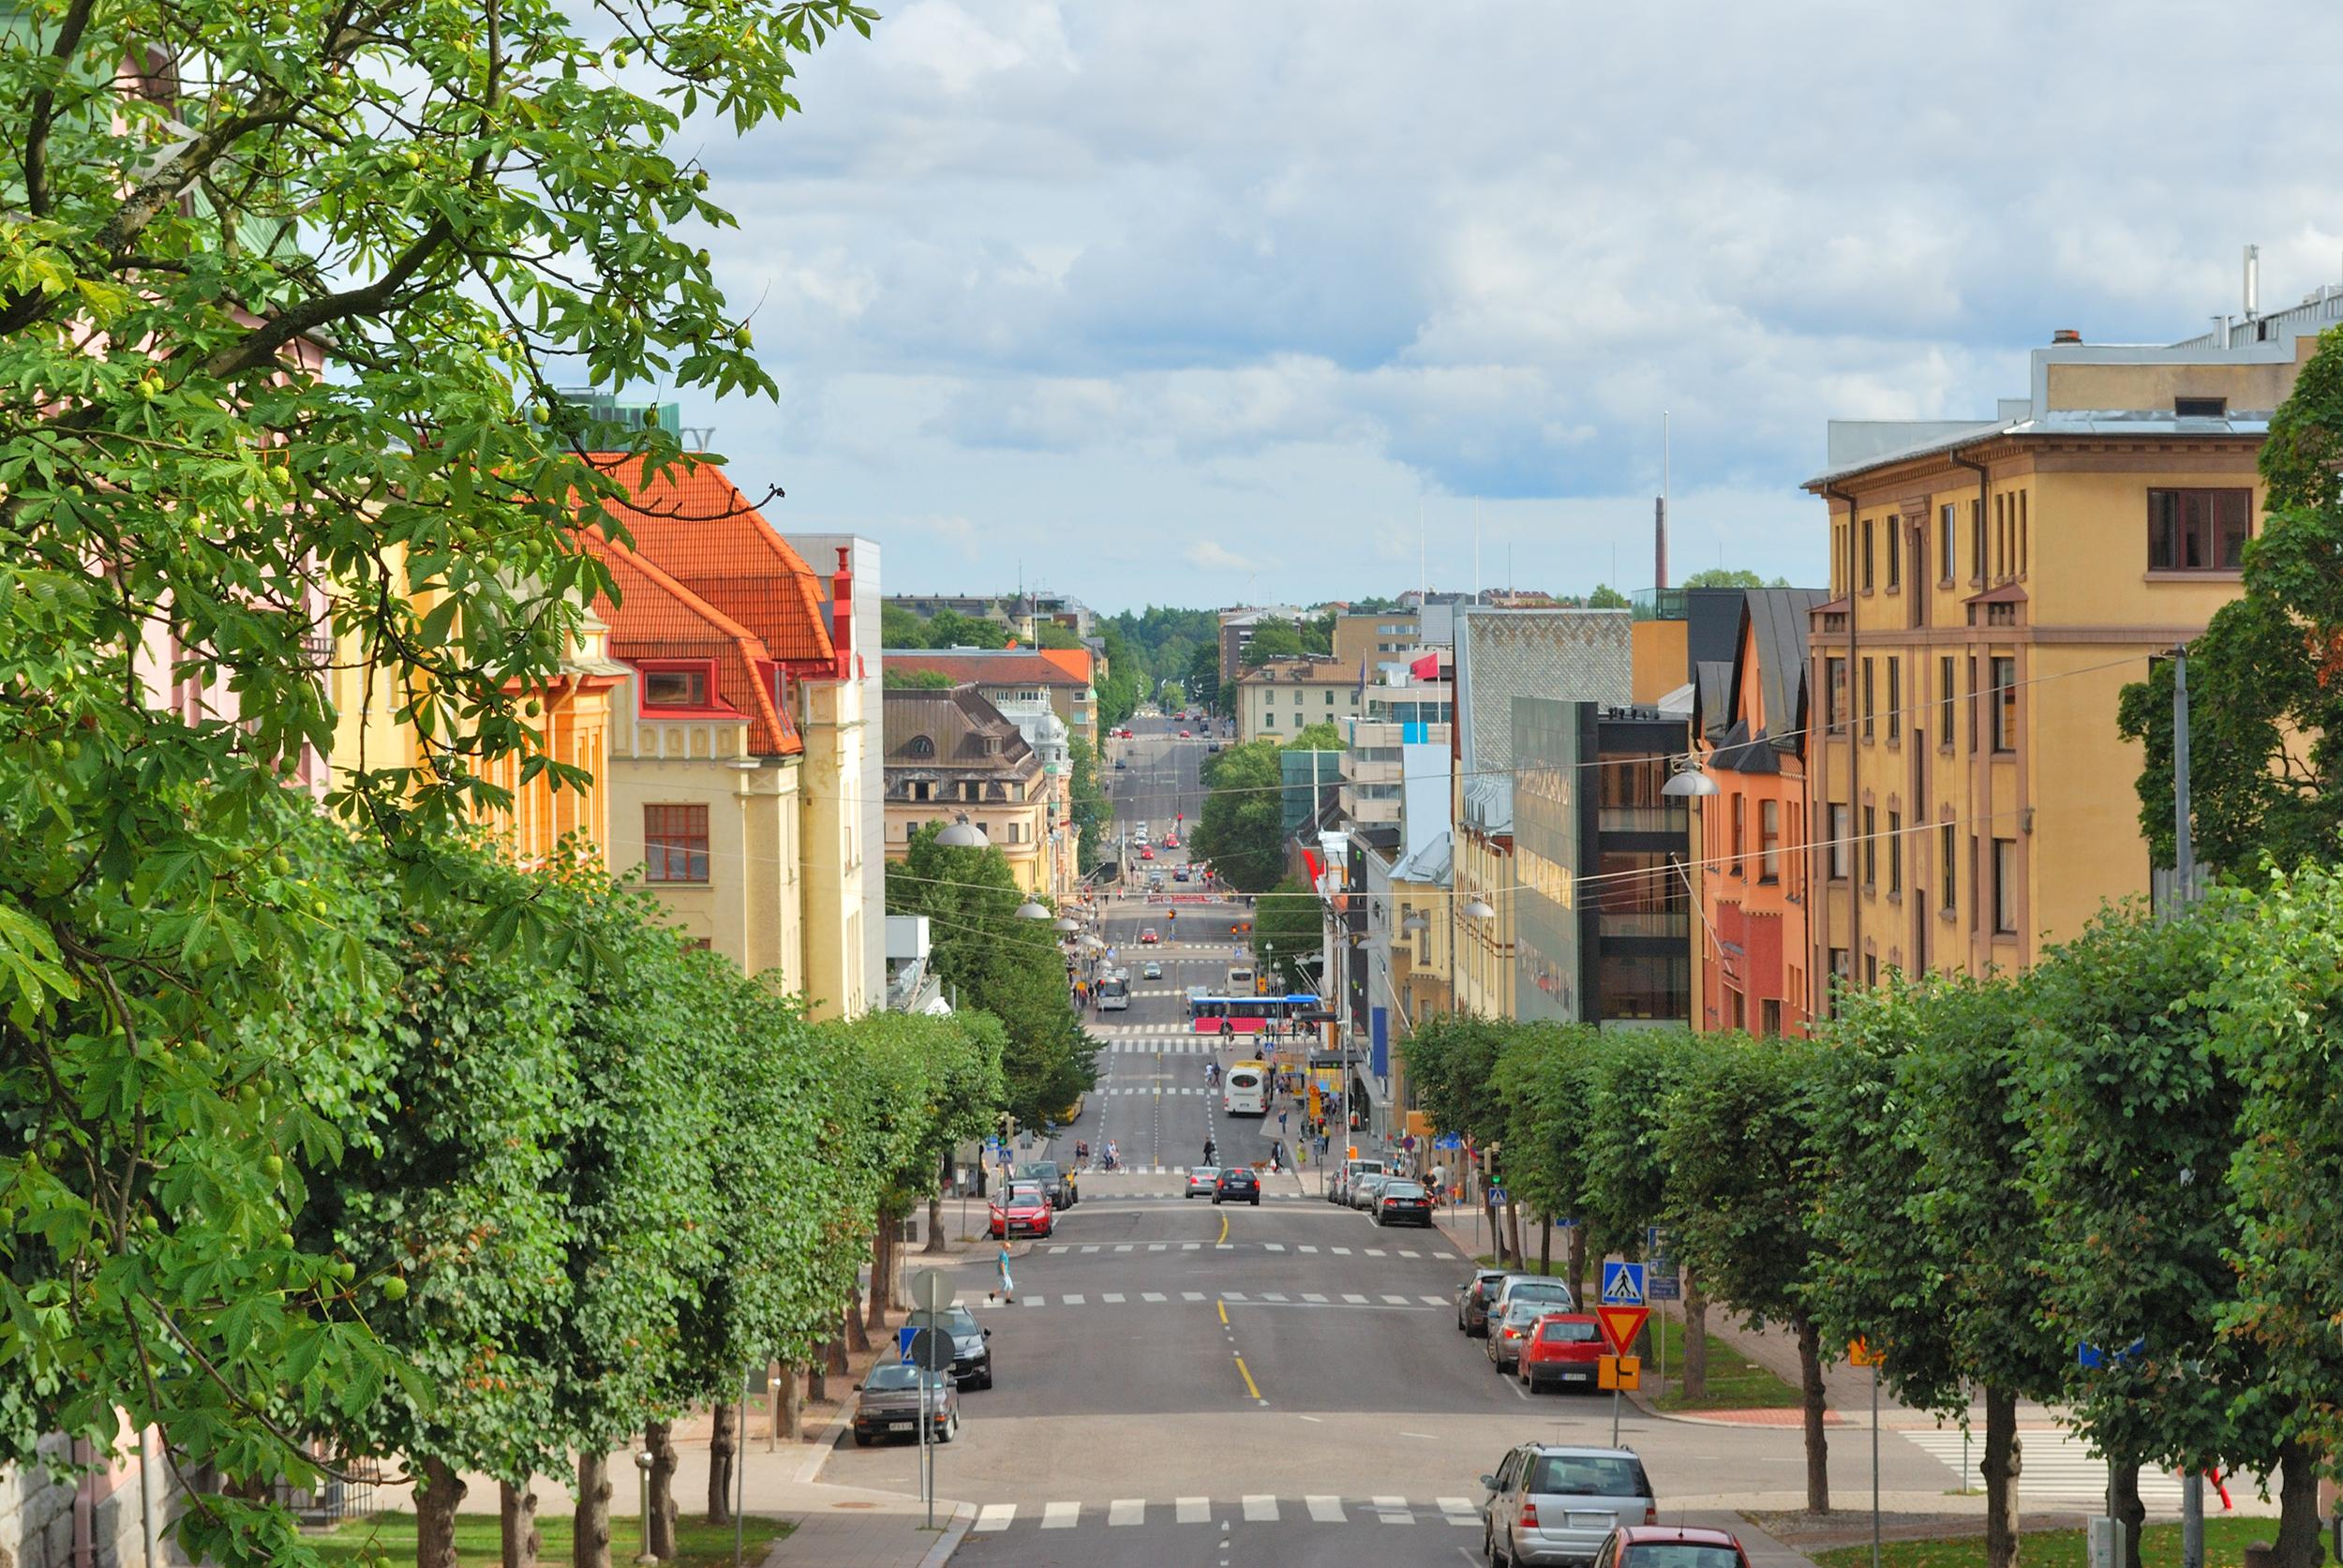 Turku (iStock)